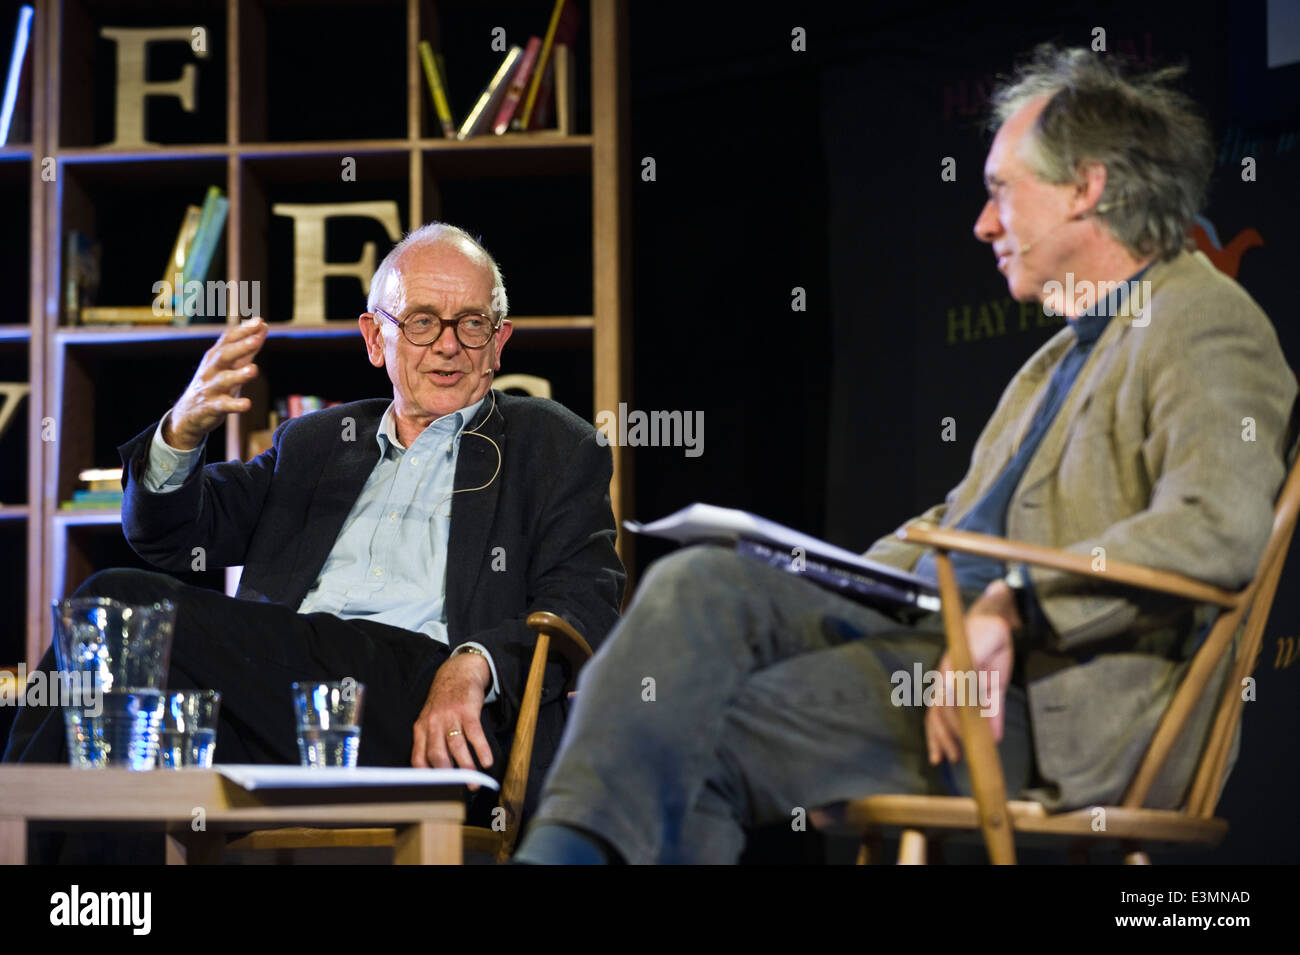 Henry Marsh neurosurgeon talking to Ian McEwan at Hay Festival 2014. Stock Photo